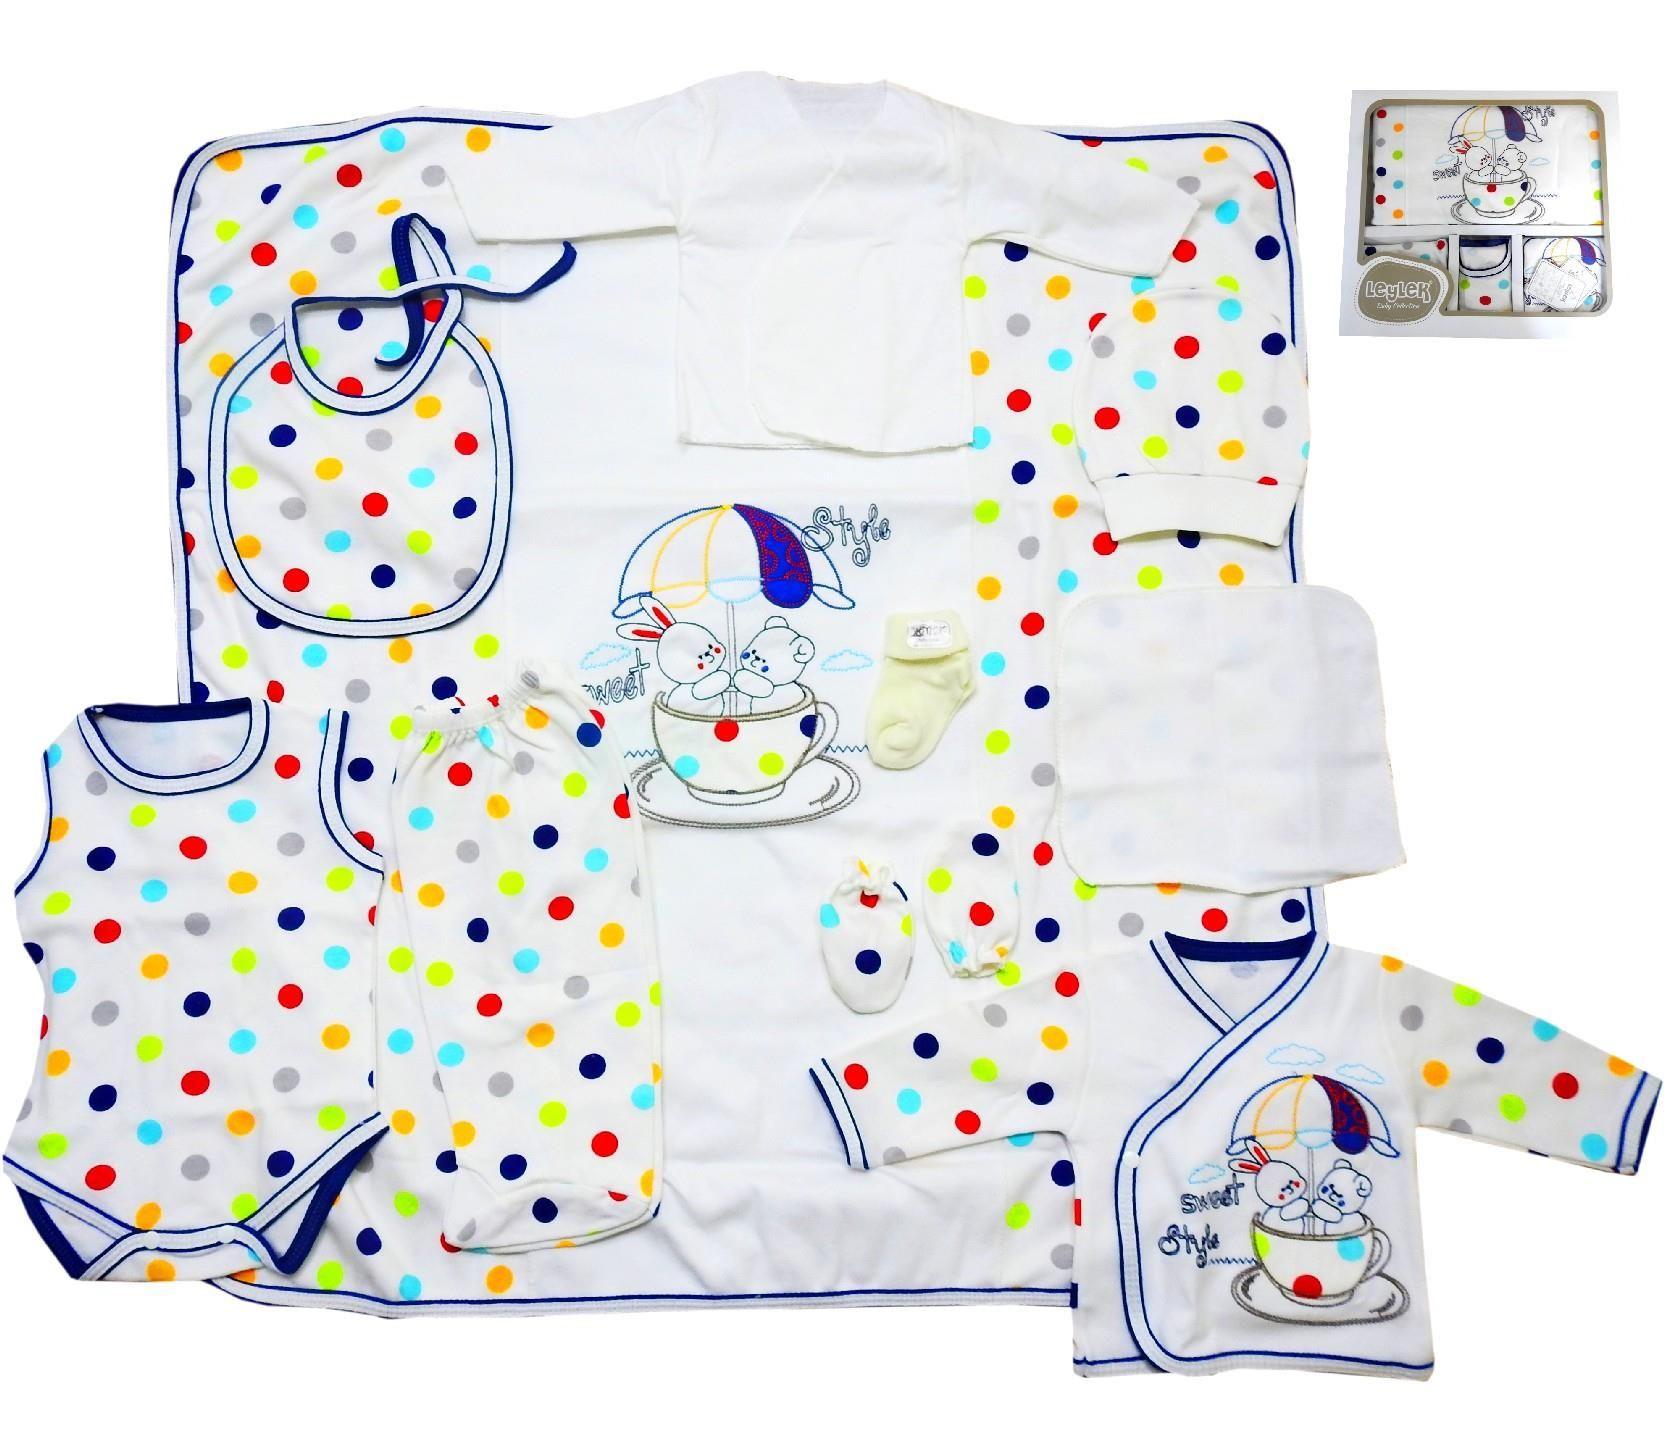 L 9032 Wholesale Rabbit Printed Colourfully Baby Newborn Set 10